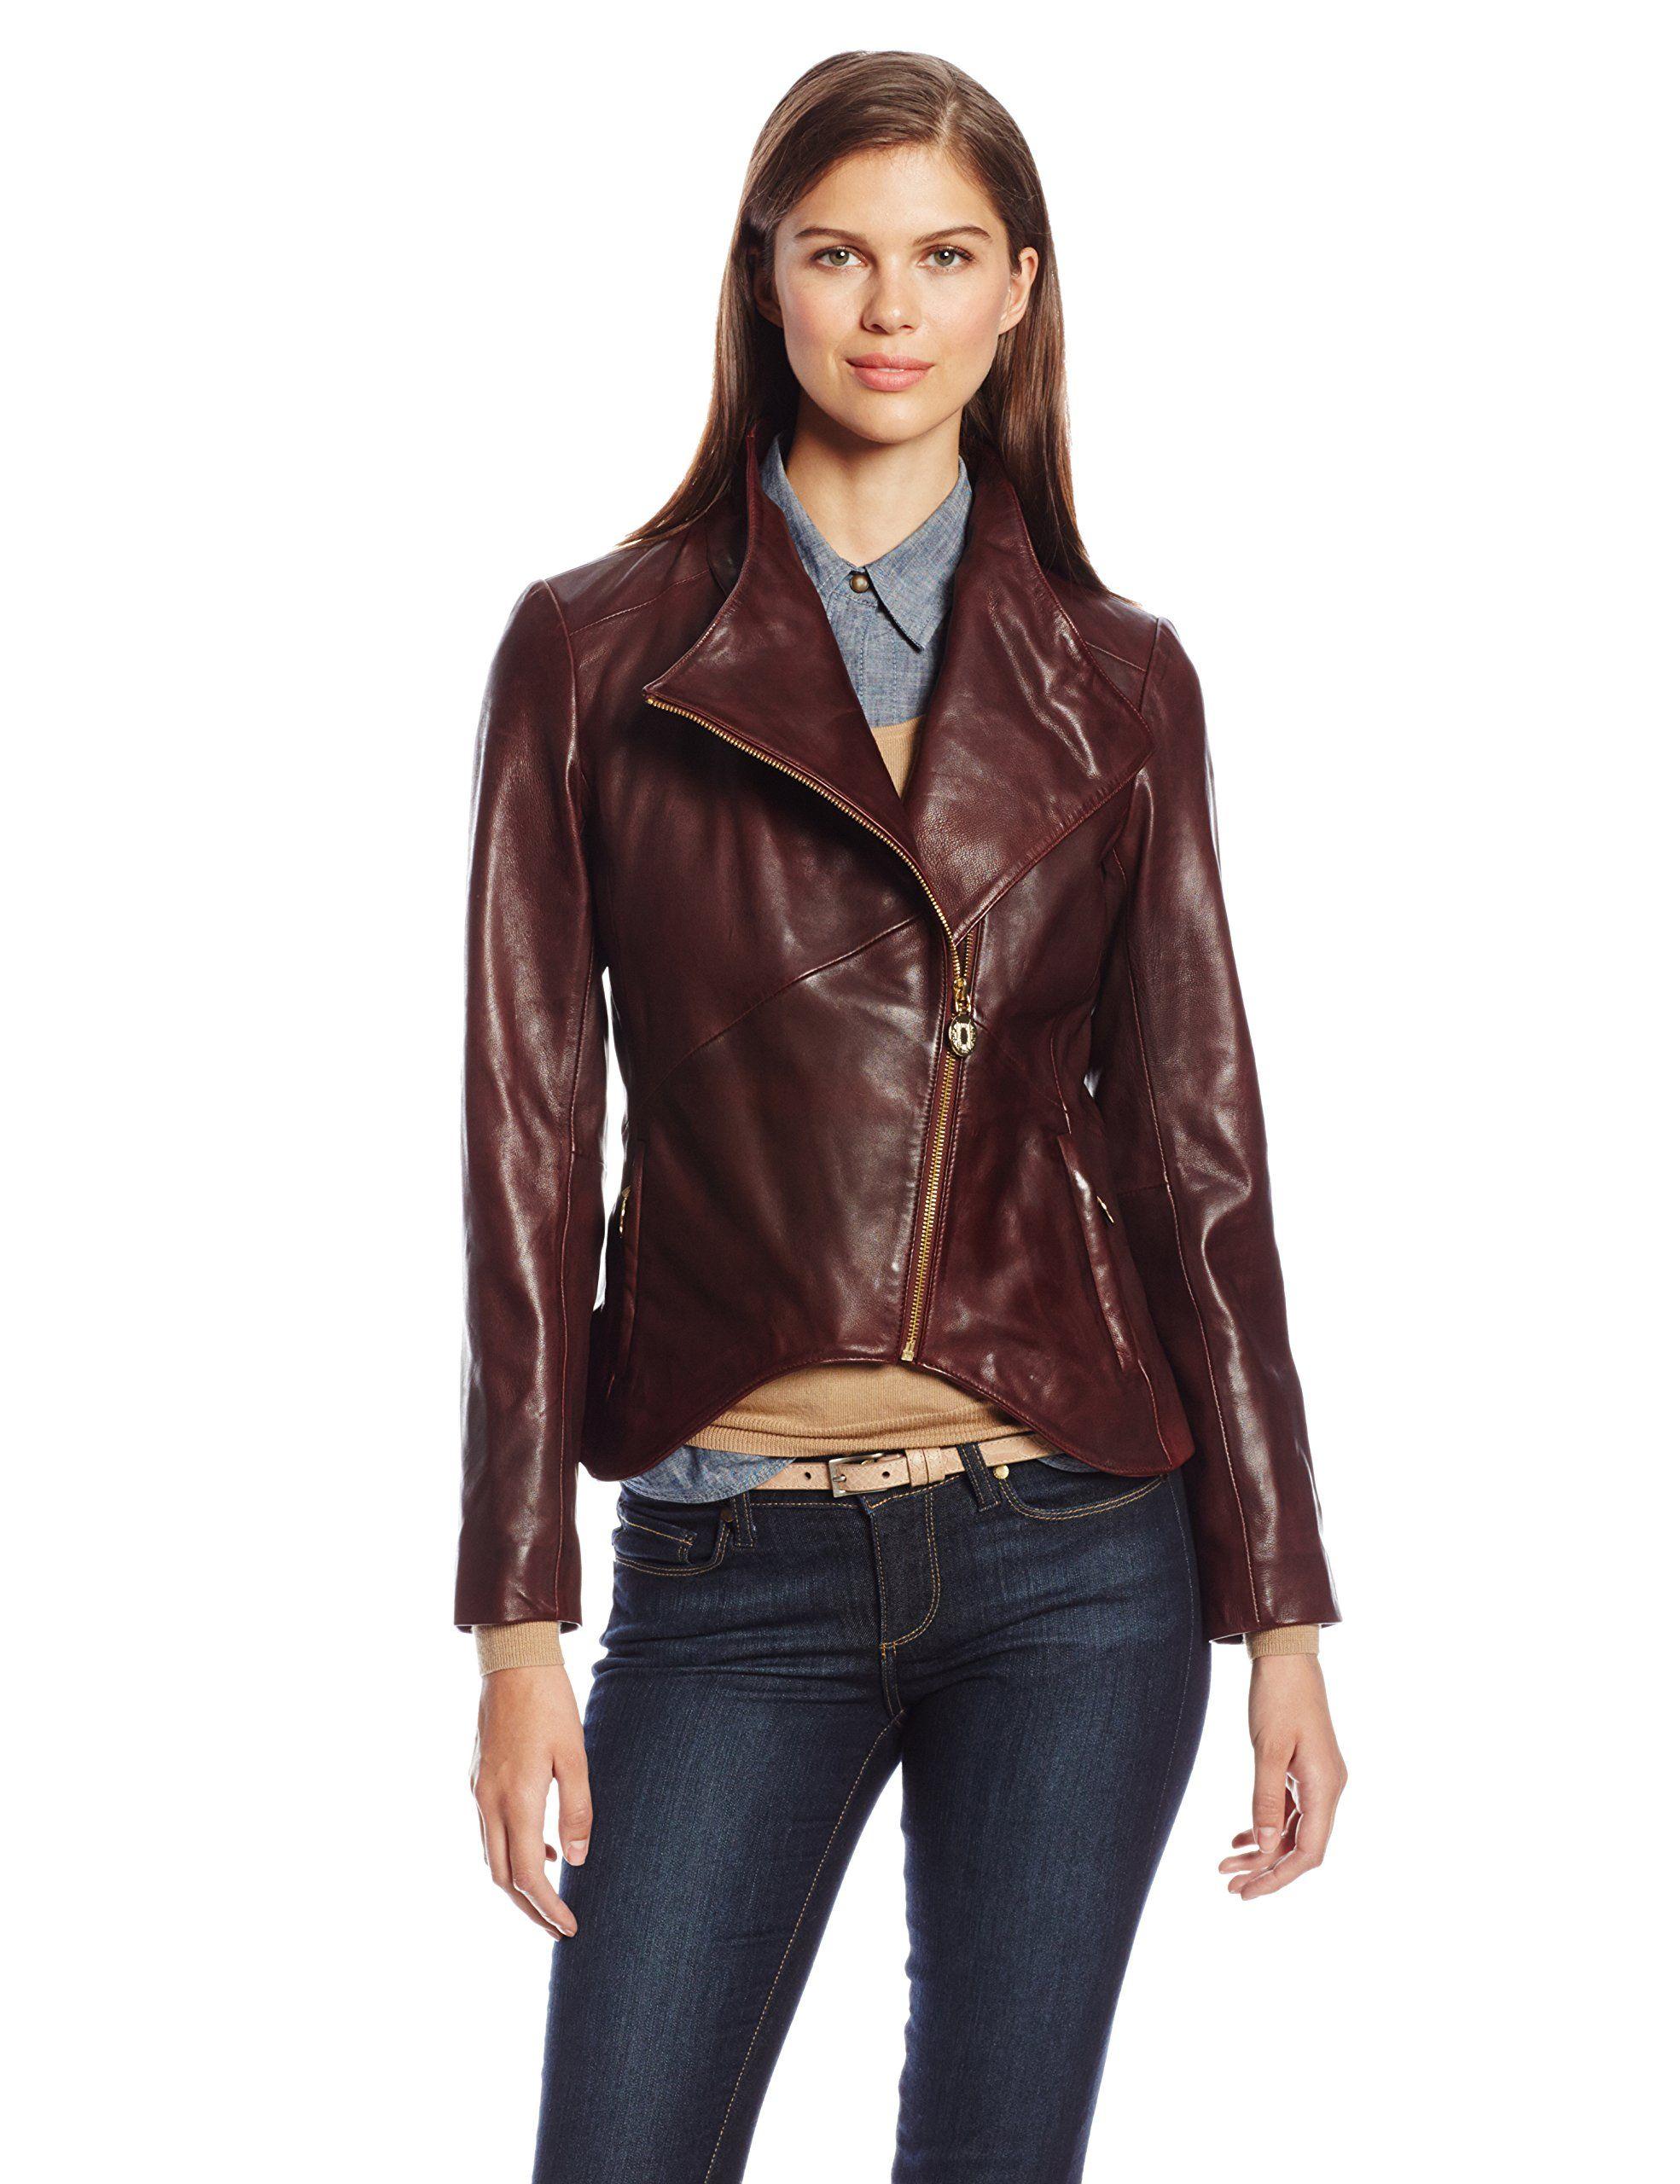 Elie Tahari Women S Beverly Leather Jacket At Amazon Women S Clothing Store My Precccciiiiouuuuussss Leather Jacket Jackets Coats For Women [ 2560 x 1969 Pixel ]